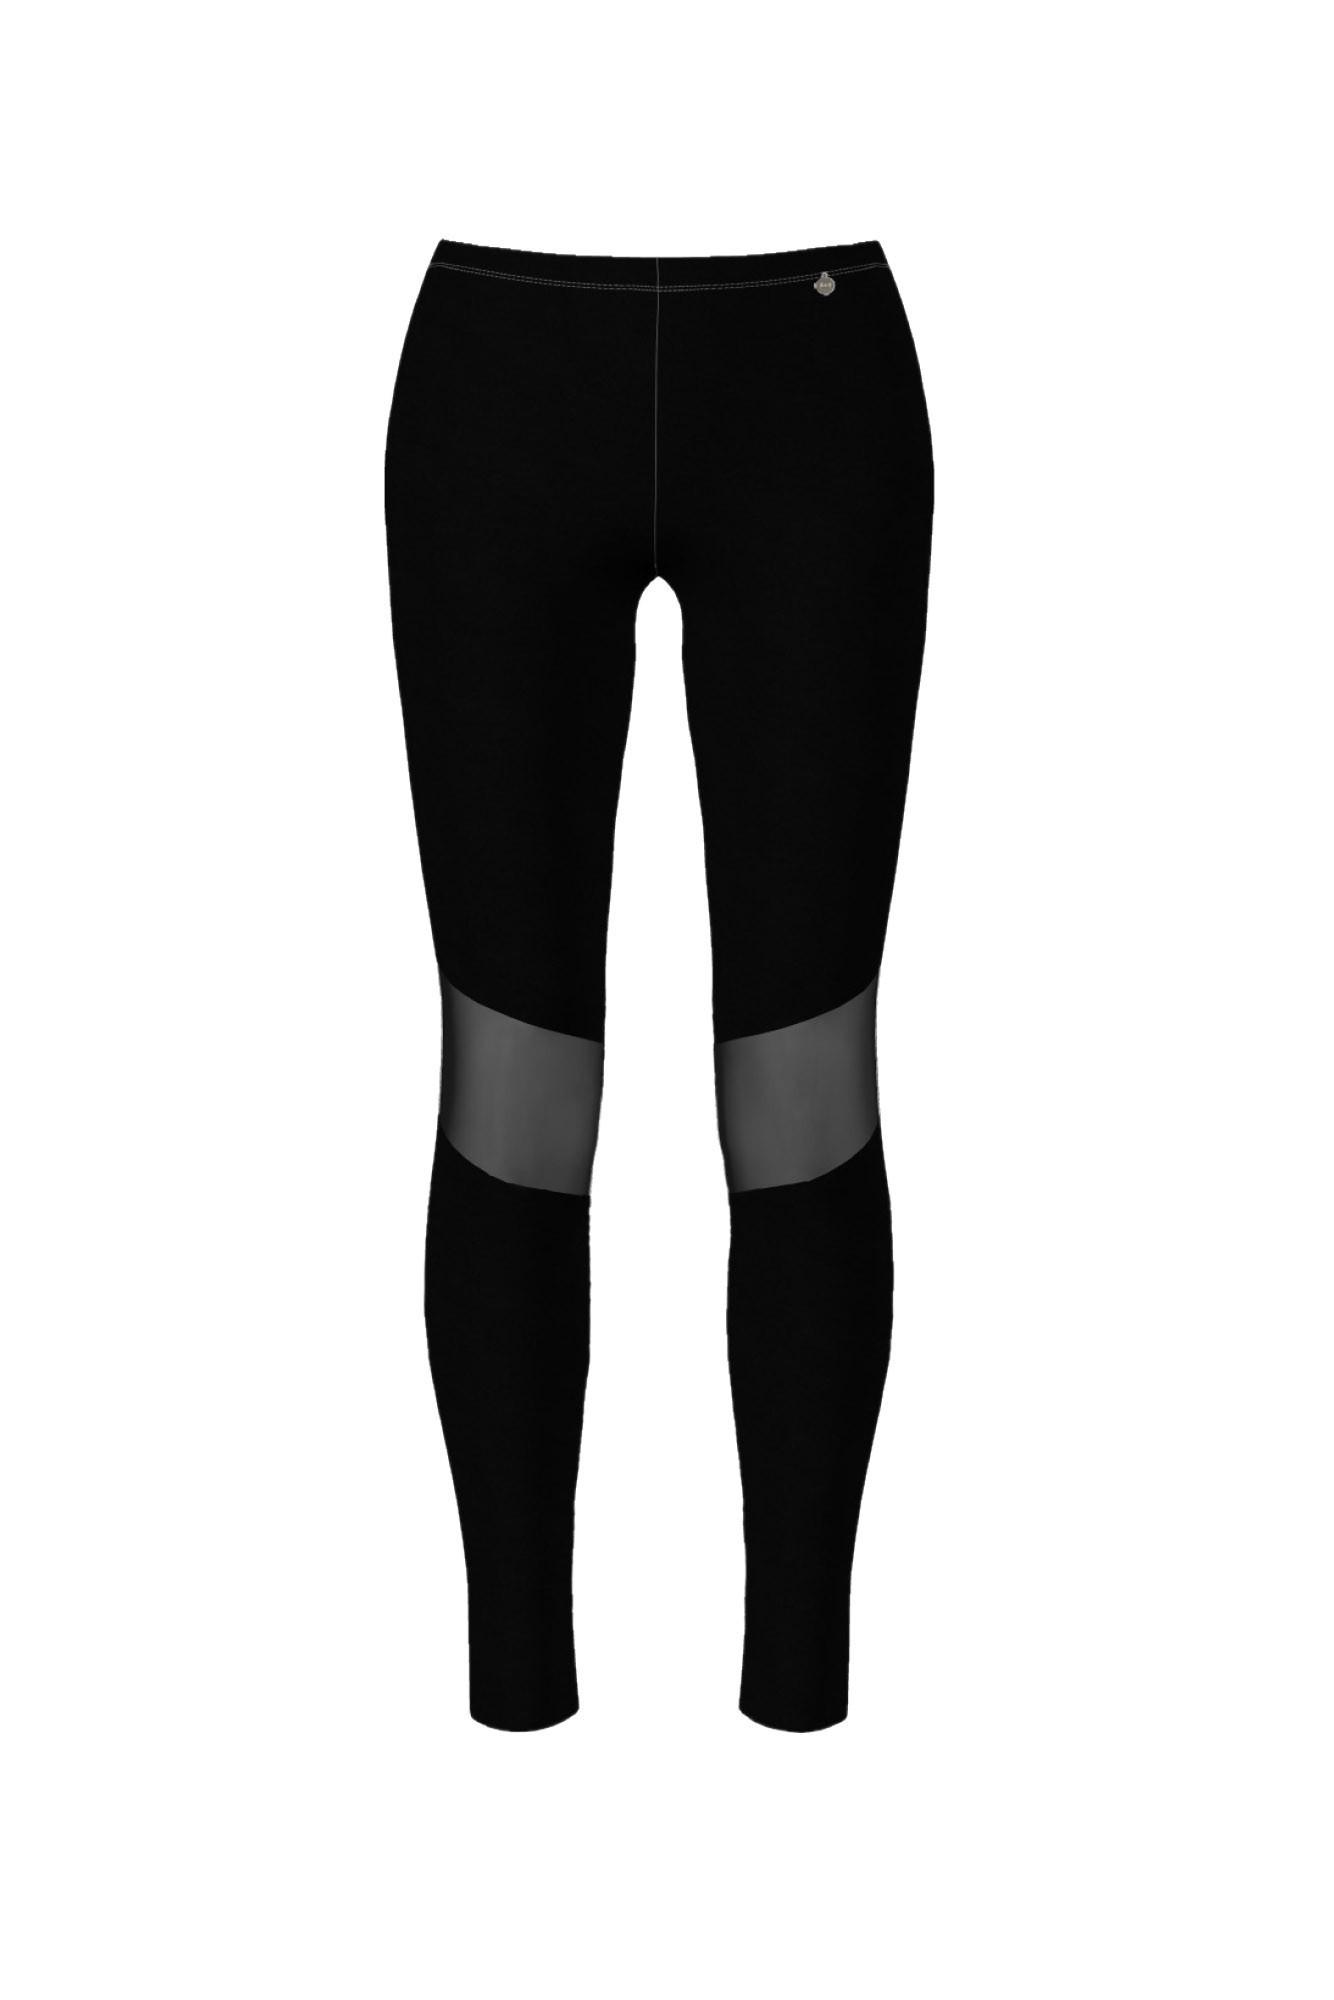 Vamp - Dámske legíny 13859 - Vamp black l